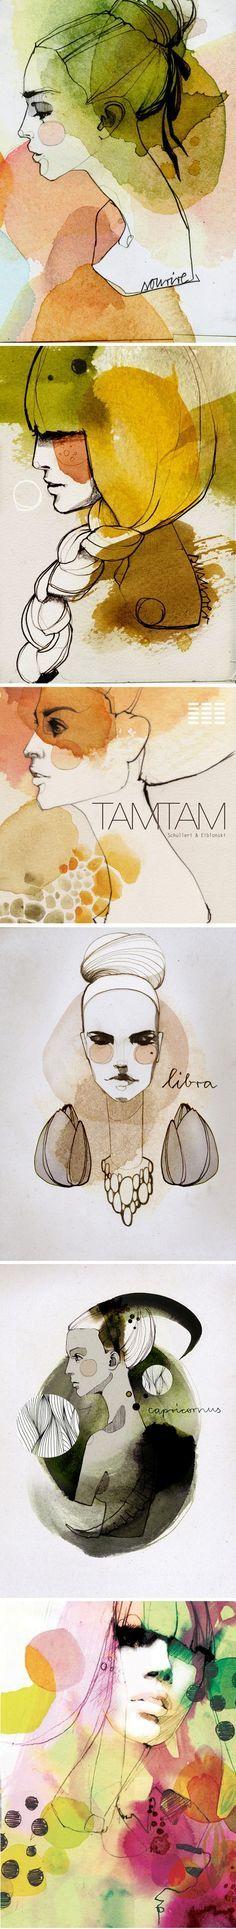 Illustrations par Ekaterina Koroleva